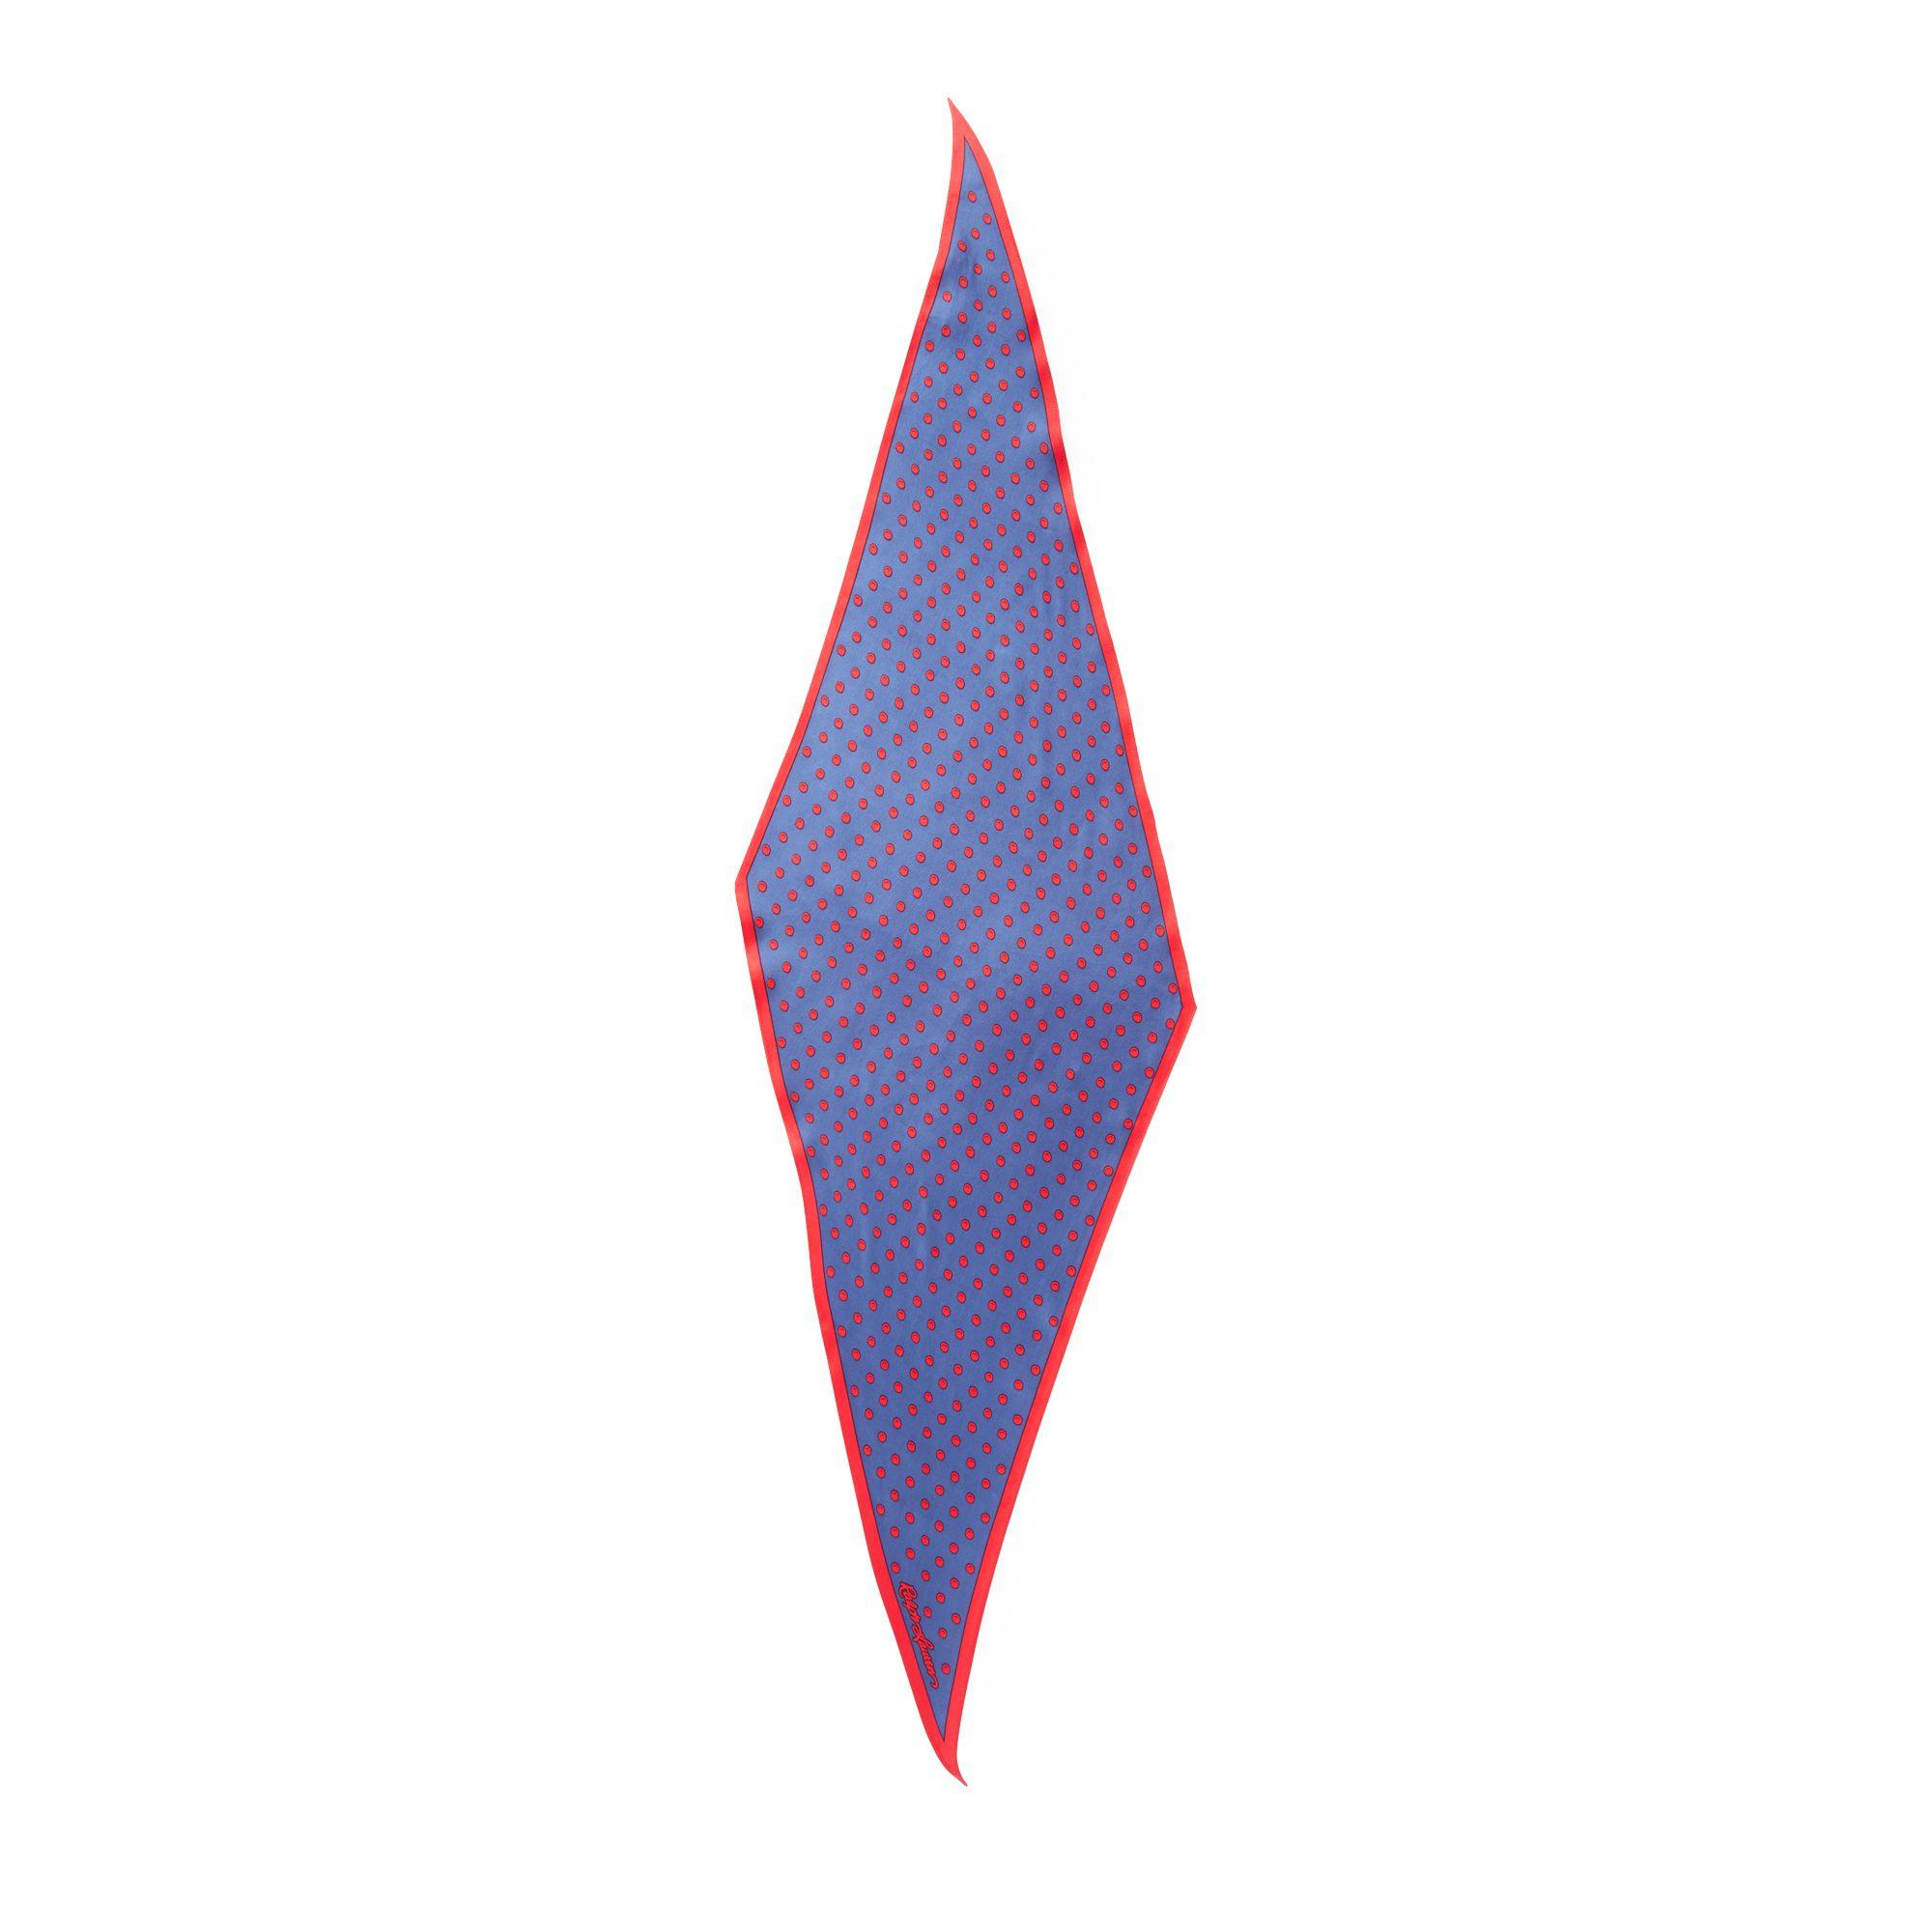 c26ce3f54c Polo Ralph Lauren Art Deco Dot Silk Scarf in Blue - Lyst